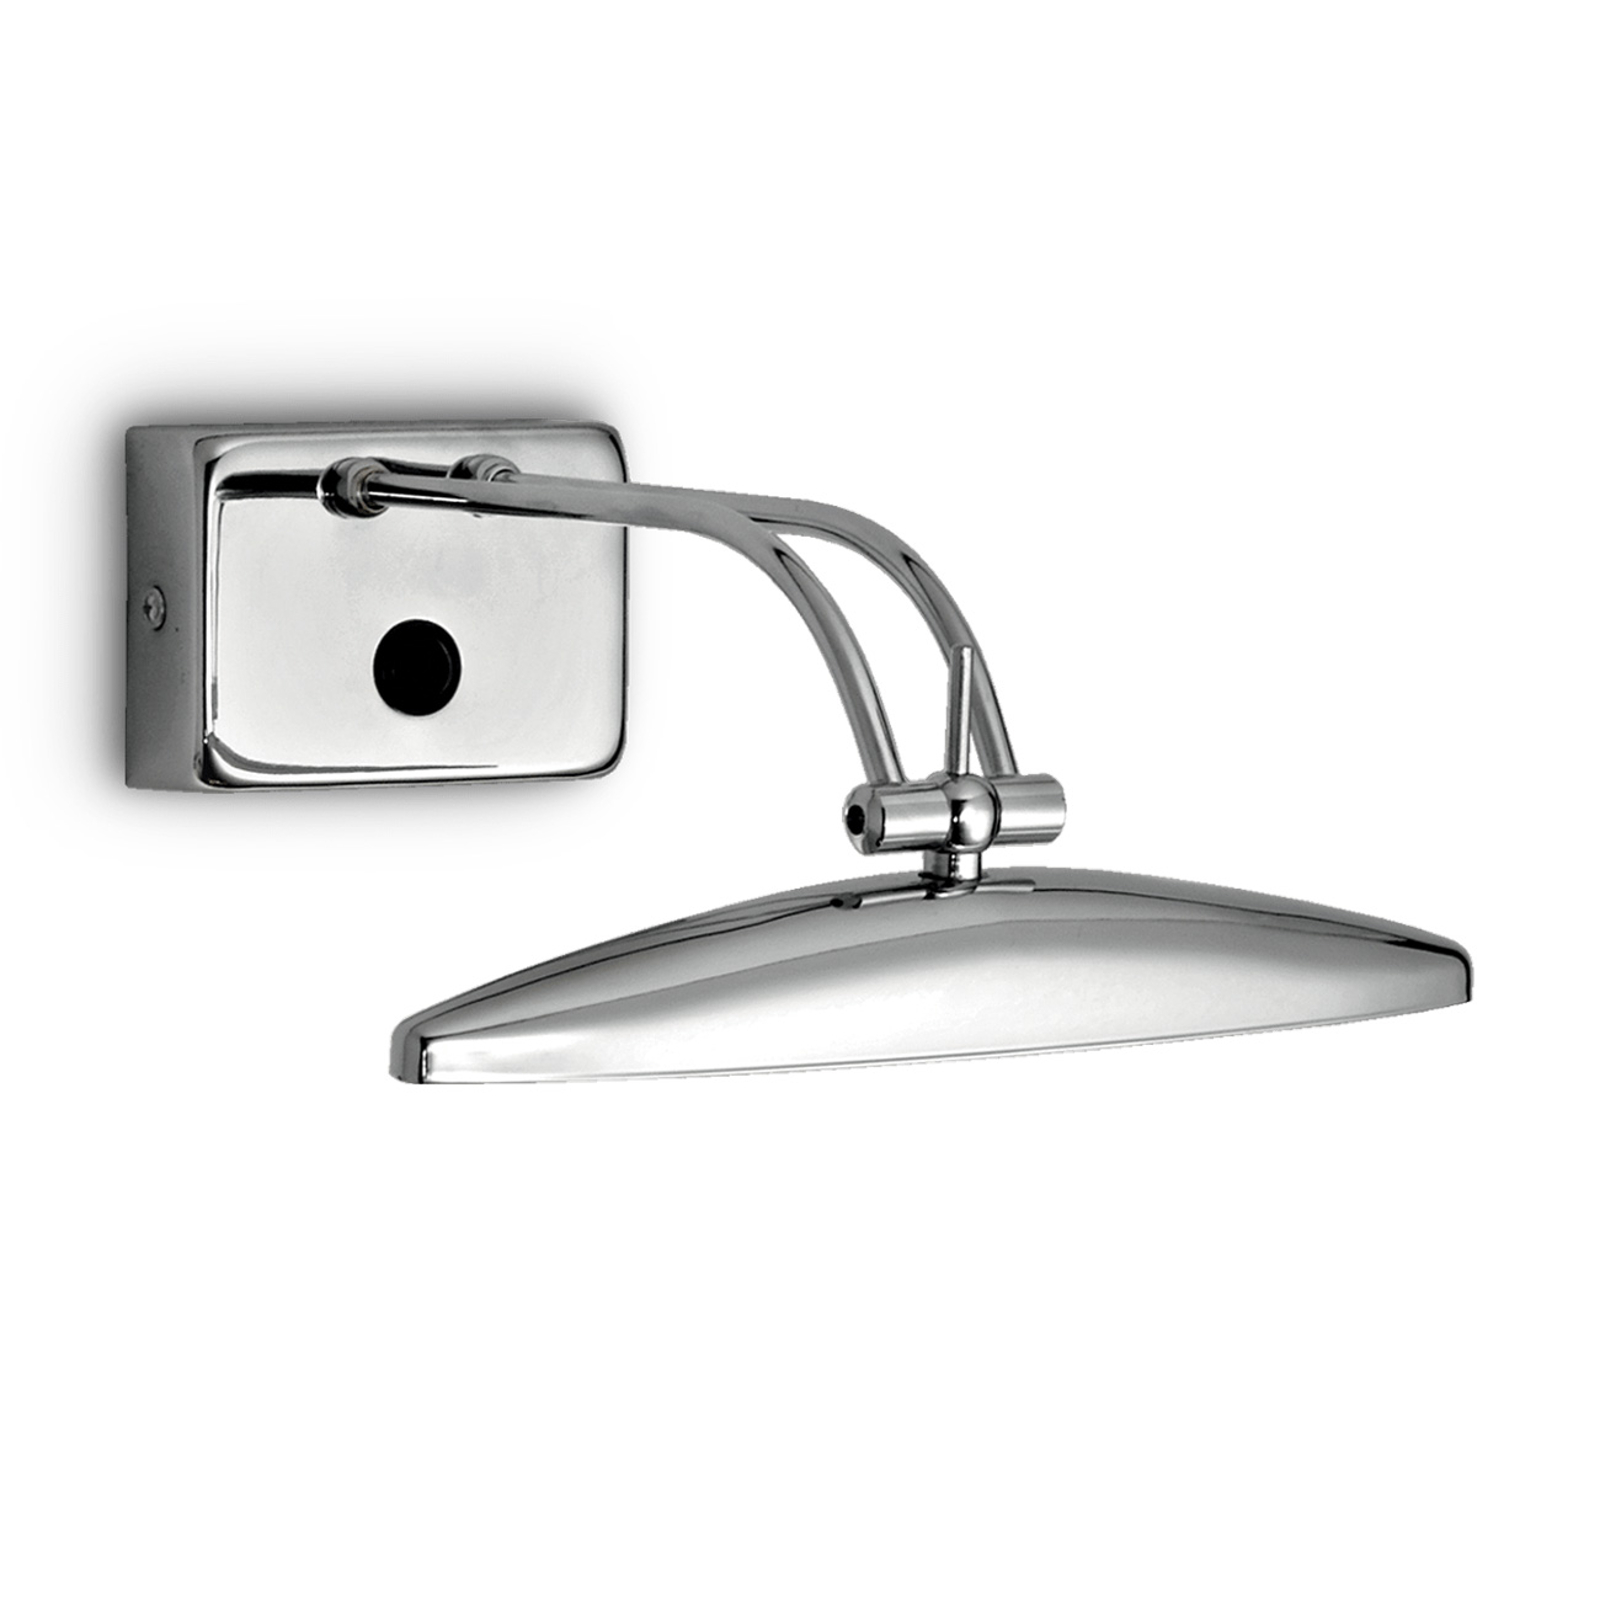 Vegglampe Mirror-20, krom, 25 cm